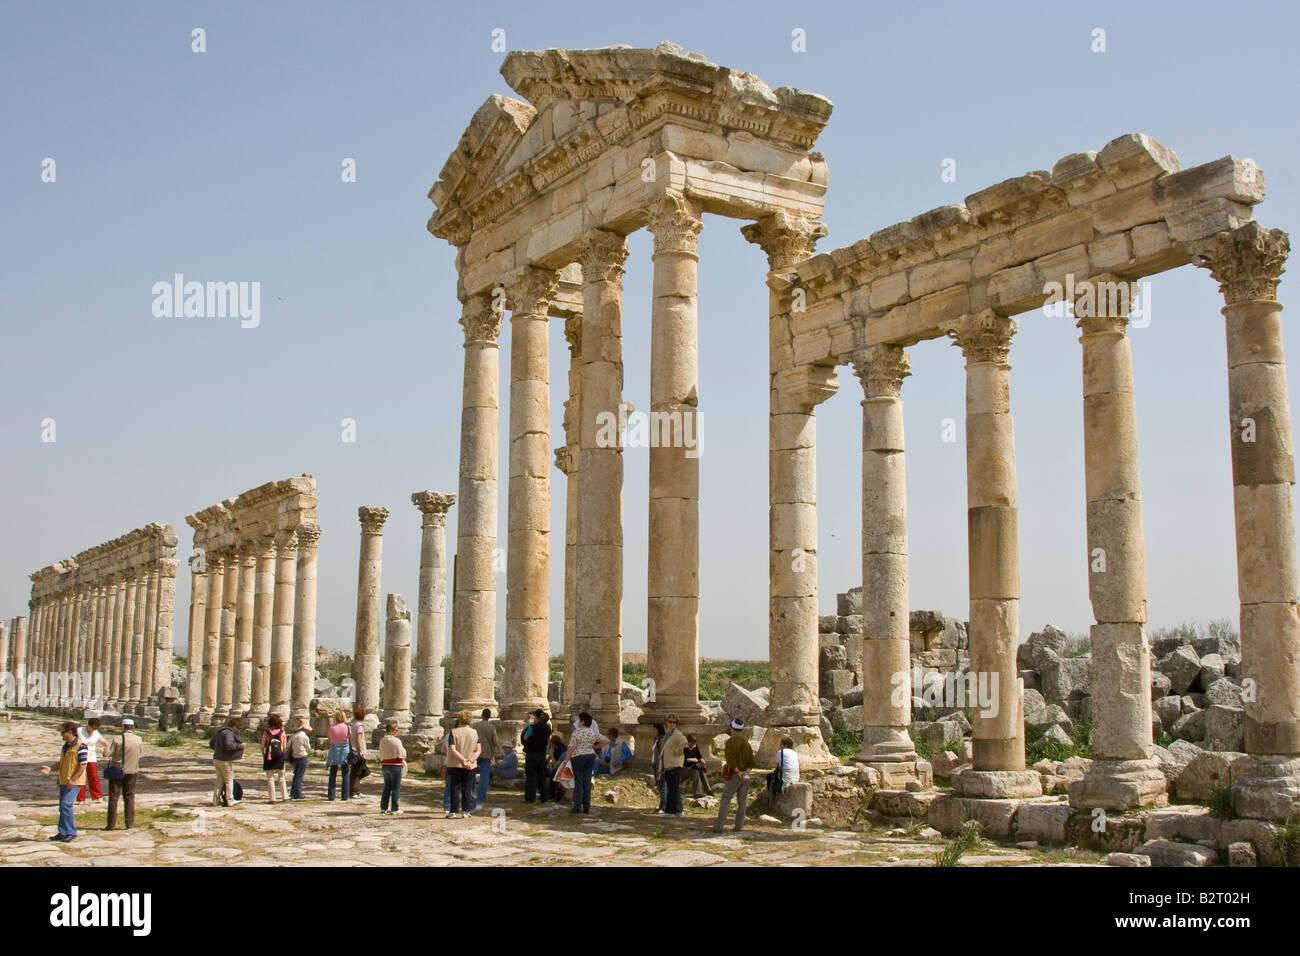 Tour Group At Roman Ruins At Apamea Syria Stock Photo 18966601 Alamy